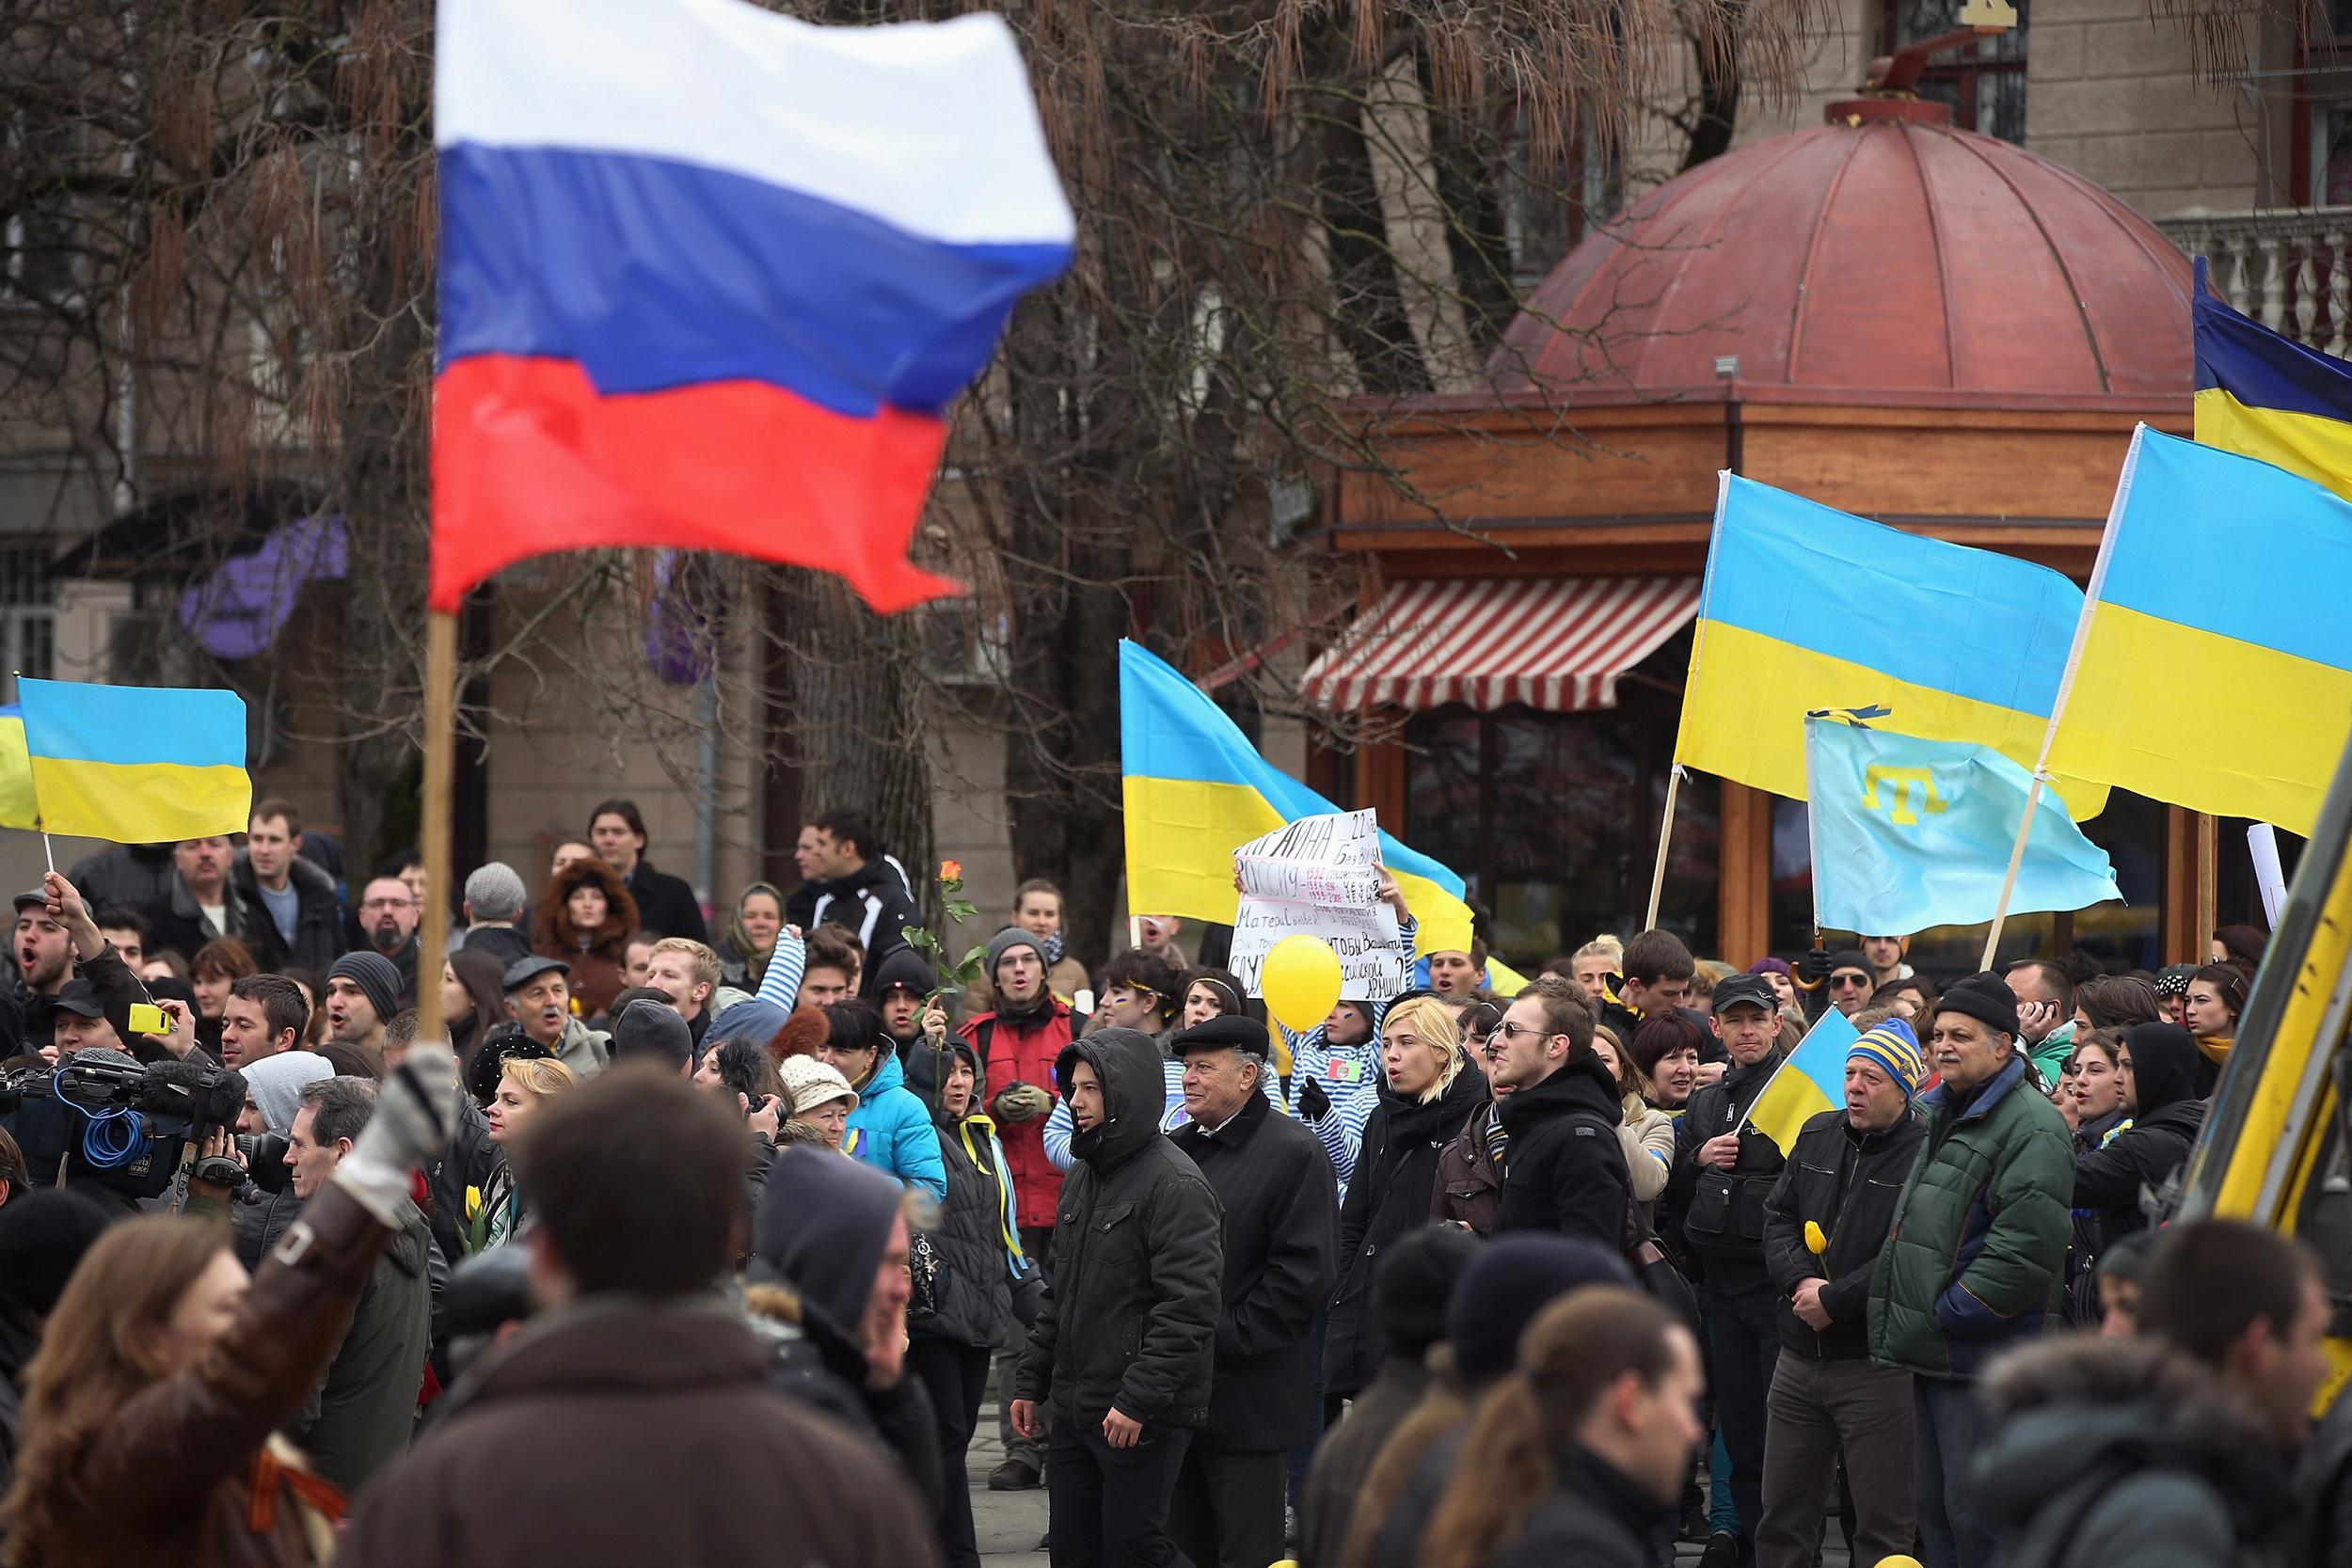 Zbigniew Brzezinski's perspective on the Russia-Ukraine crisis